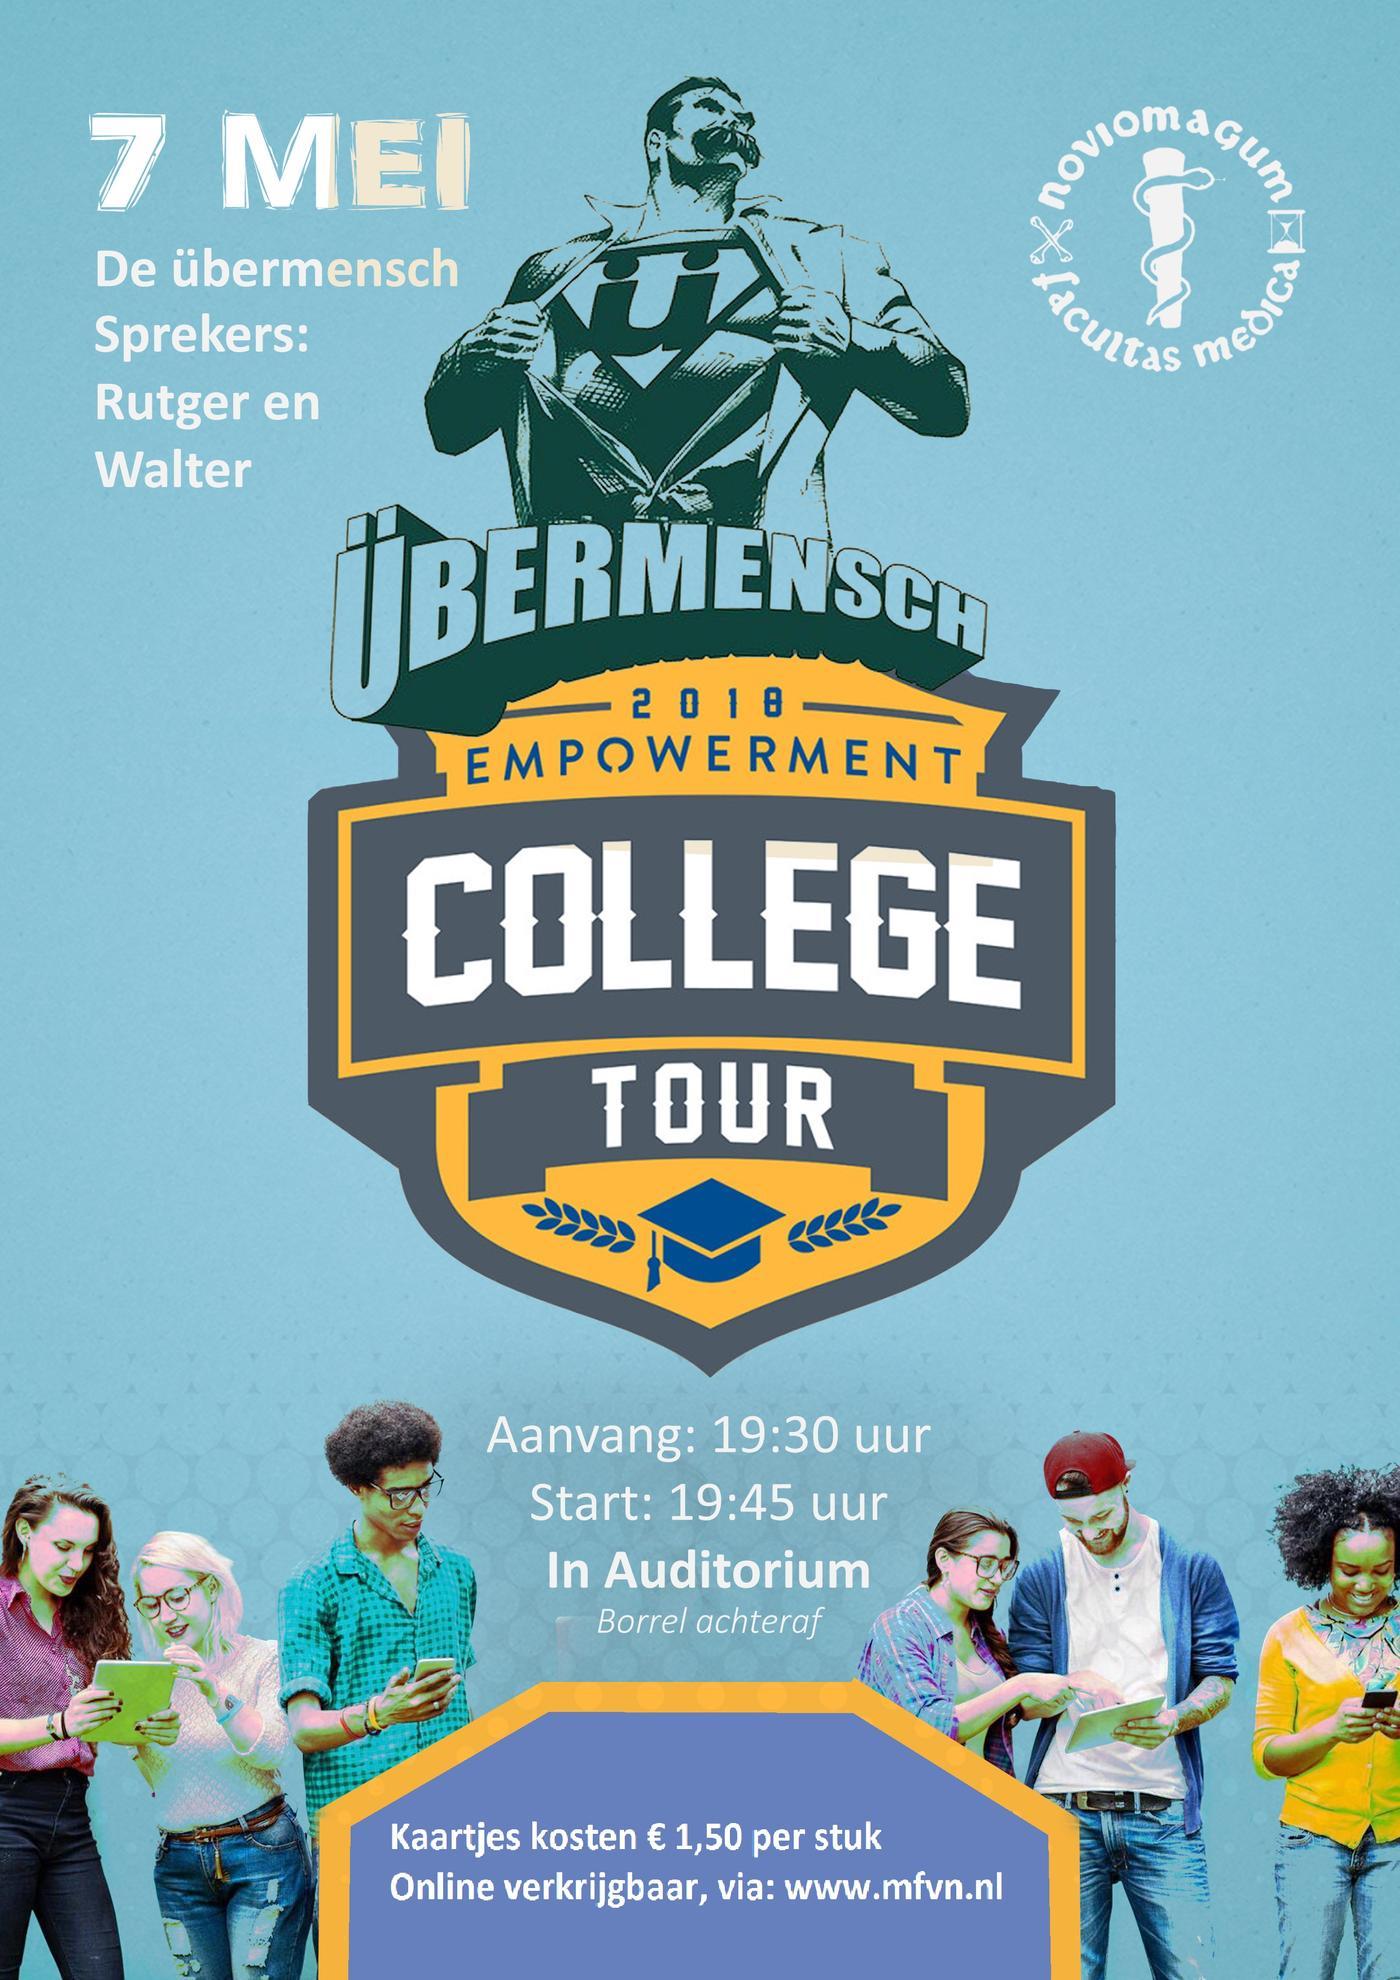 College Tour: de übermensch